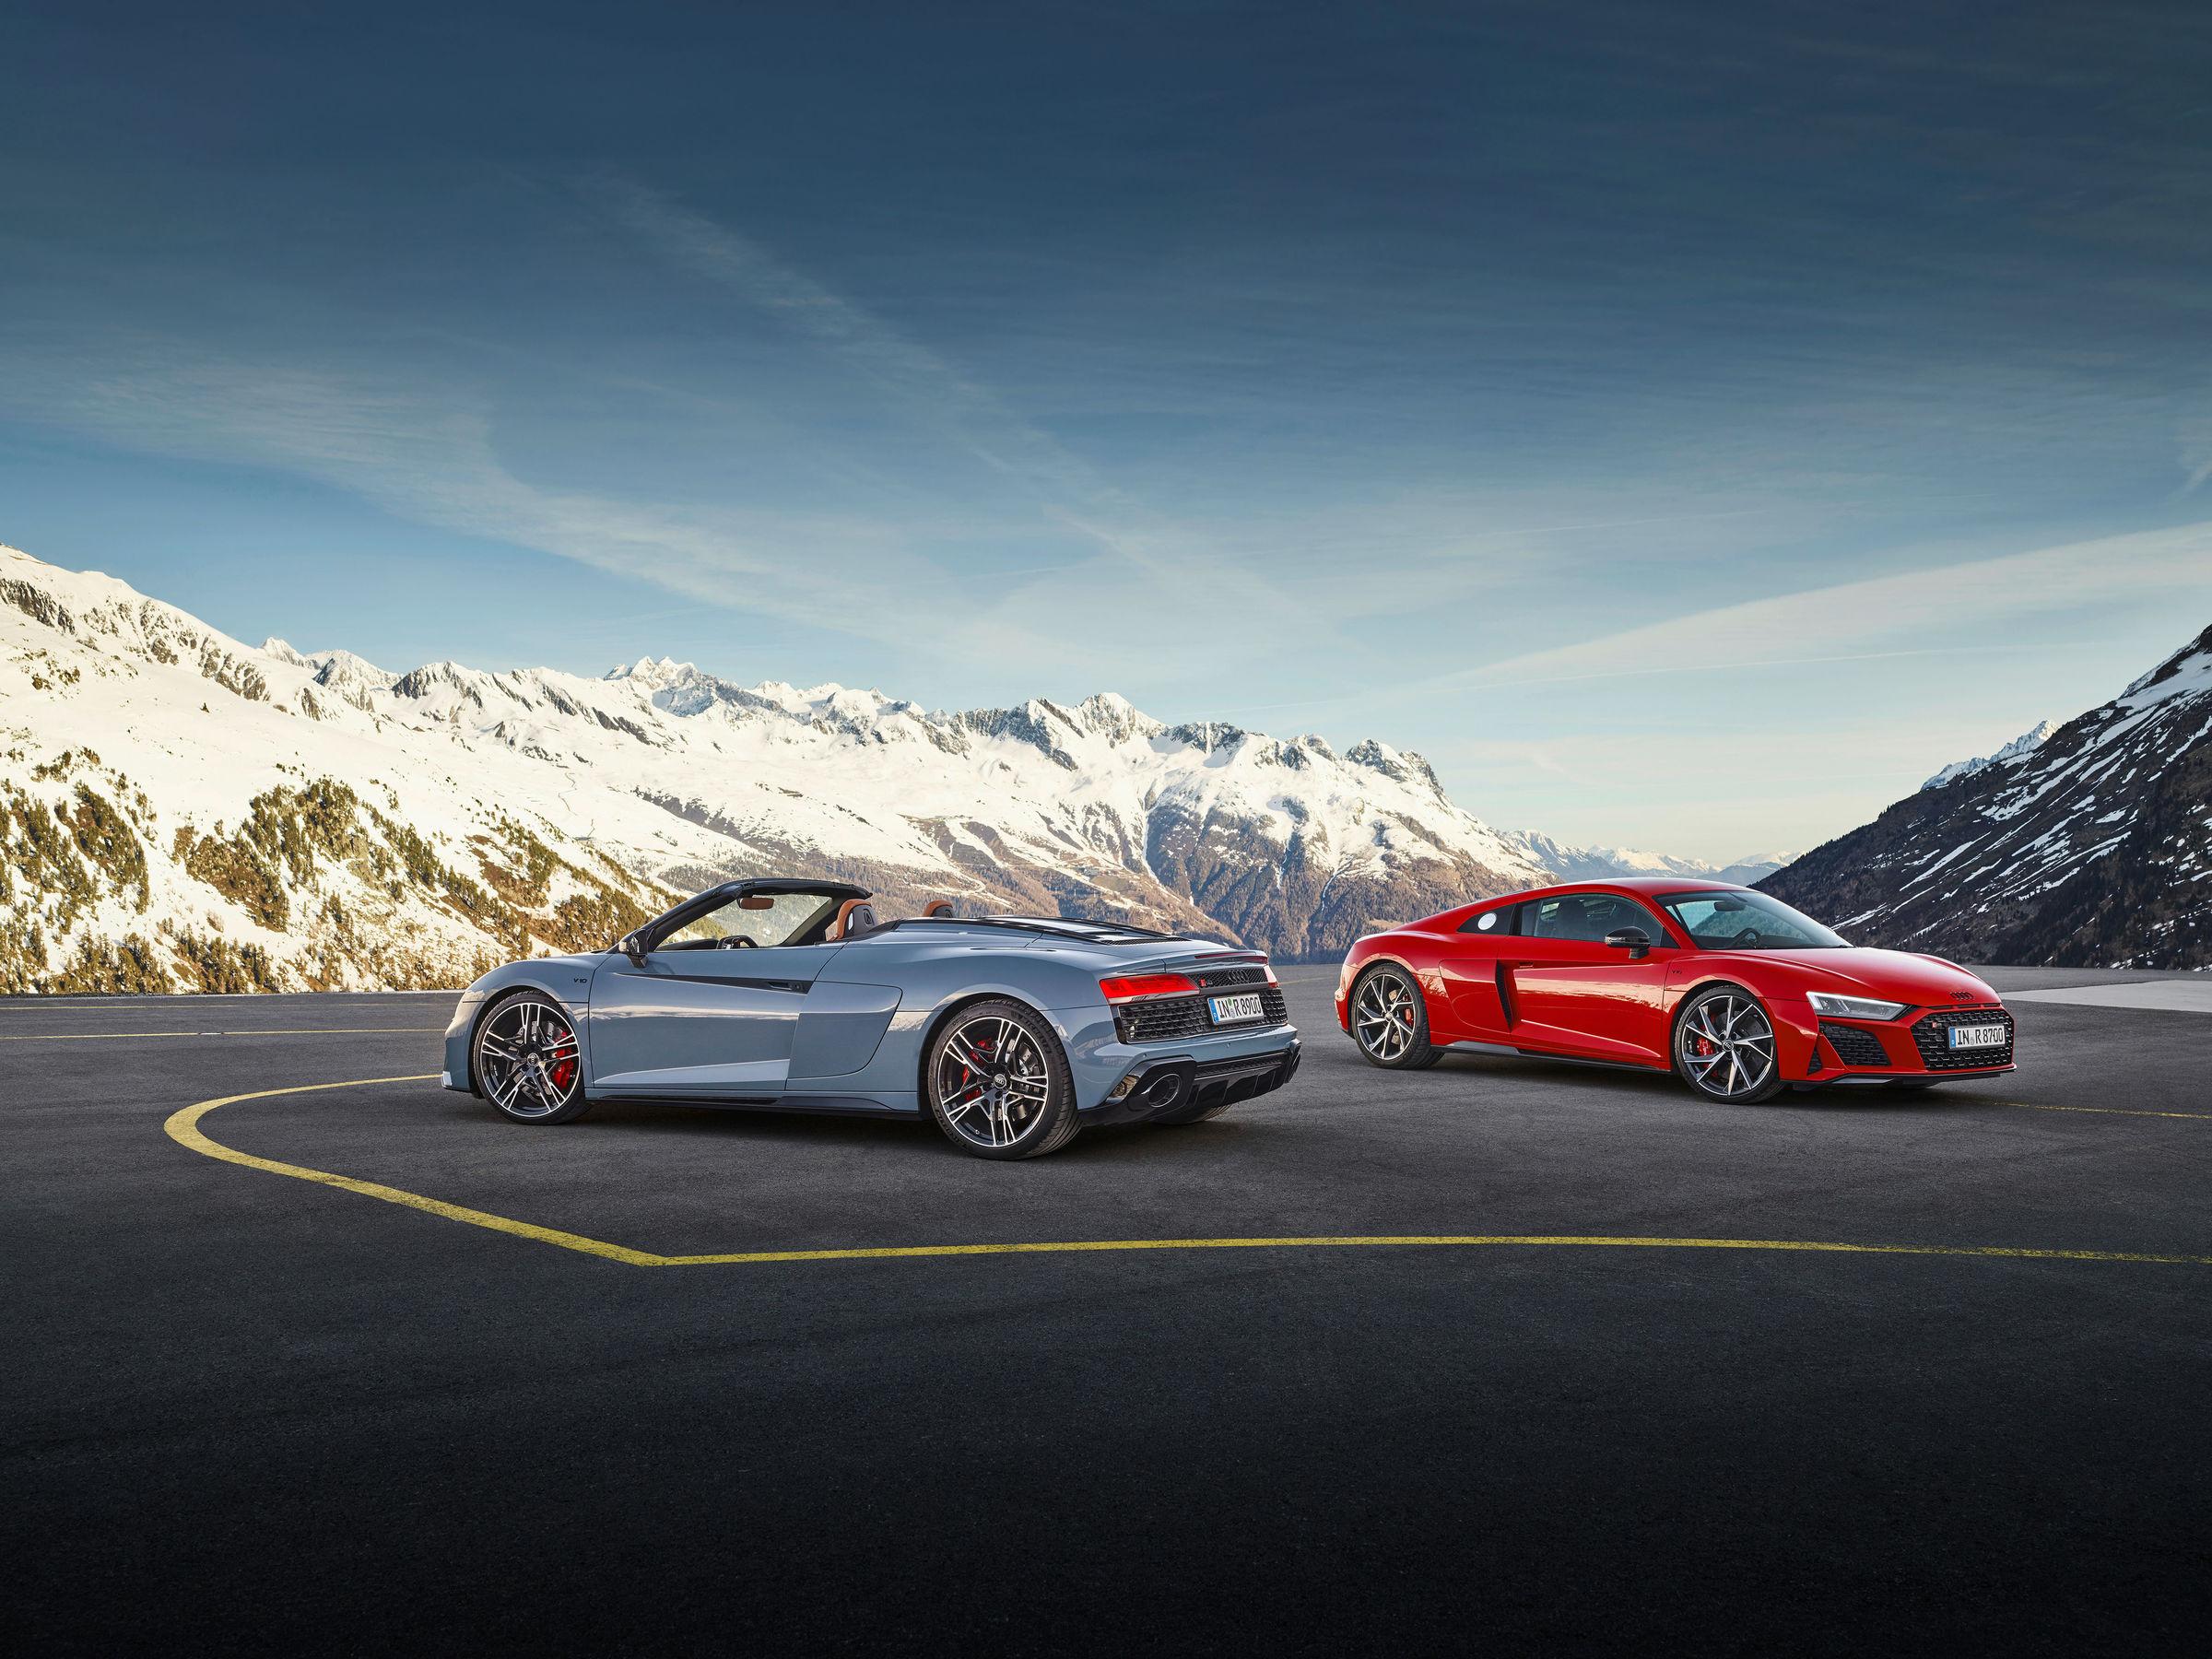 Audi R8 Spyder V10 performance RWD / Audi R8 Coupé V10 performance RWD